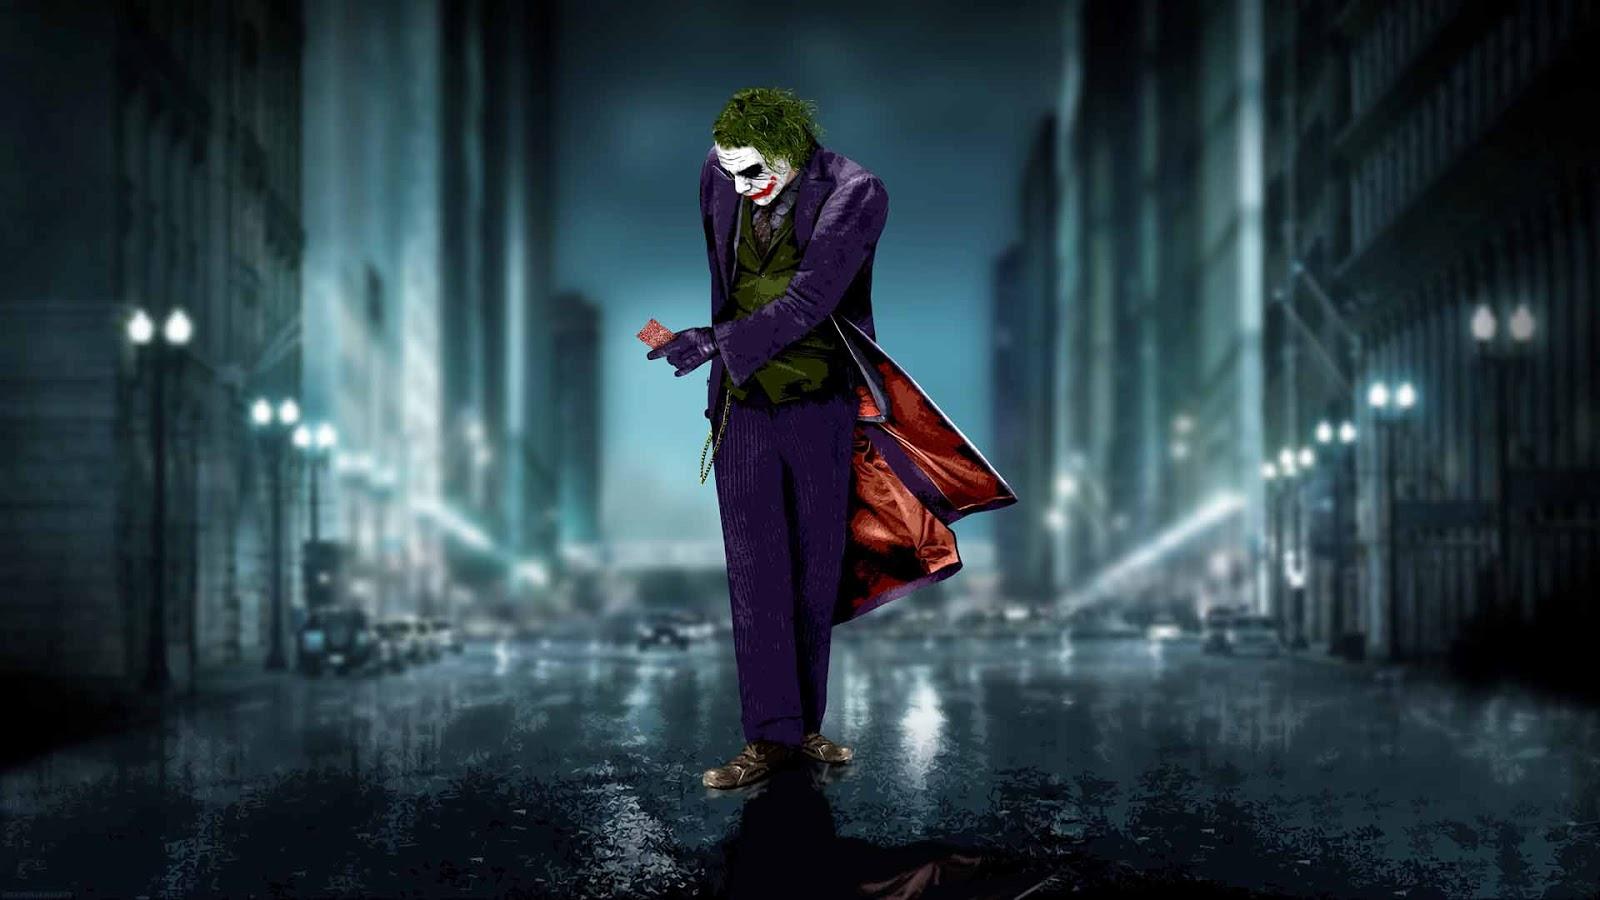 Wallpaper download joker - Joker Hd Wallpapers Hd Wallpapers Pics